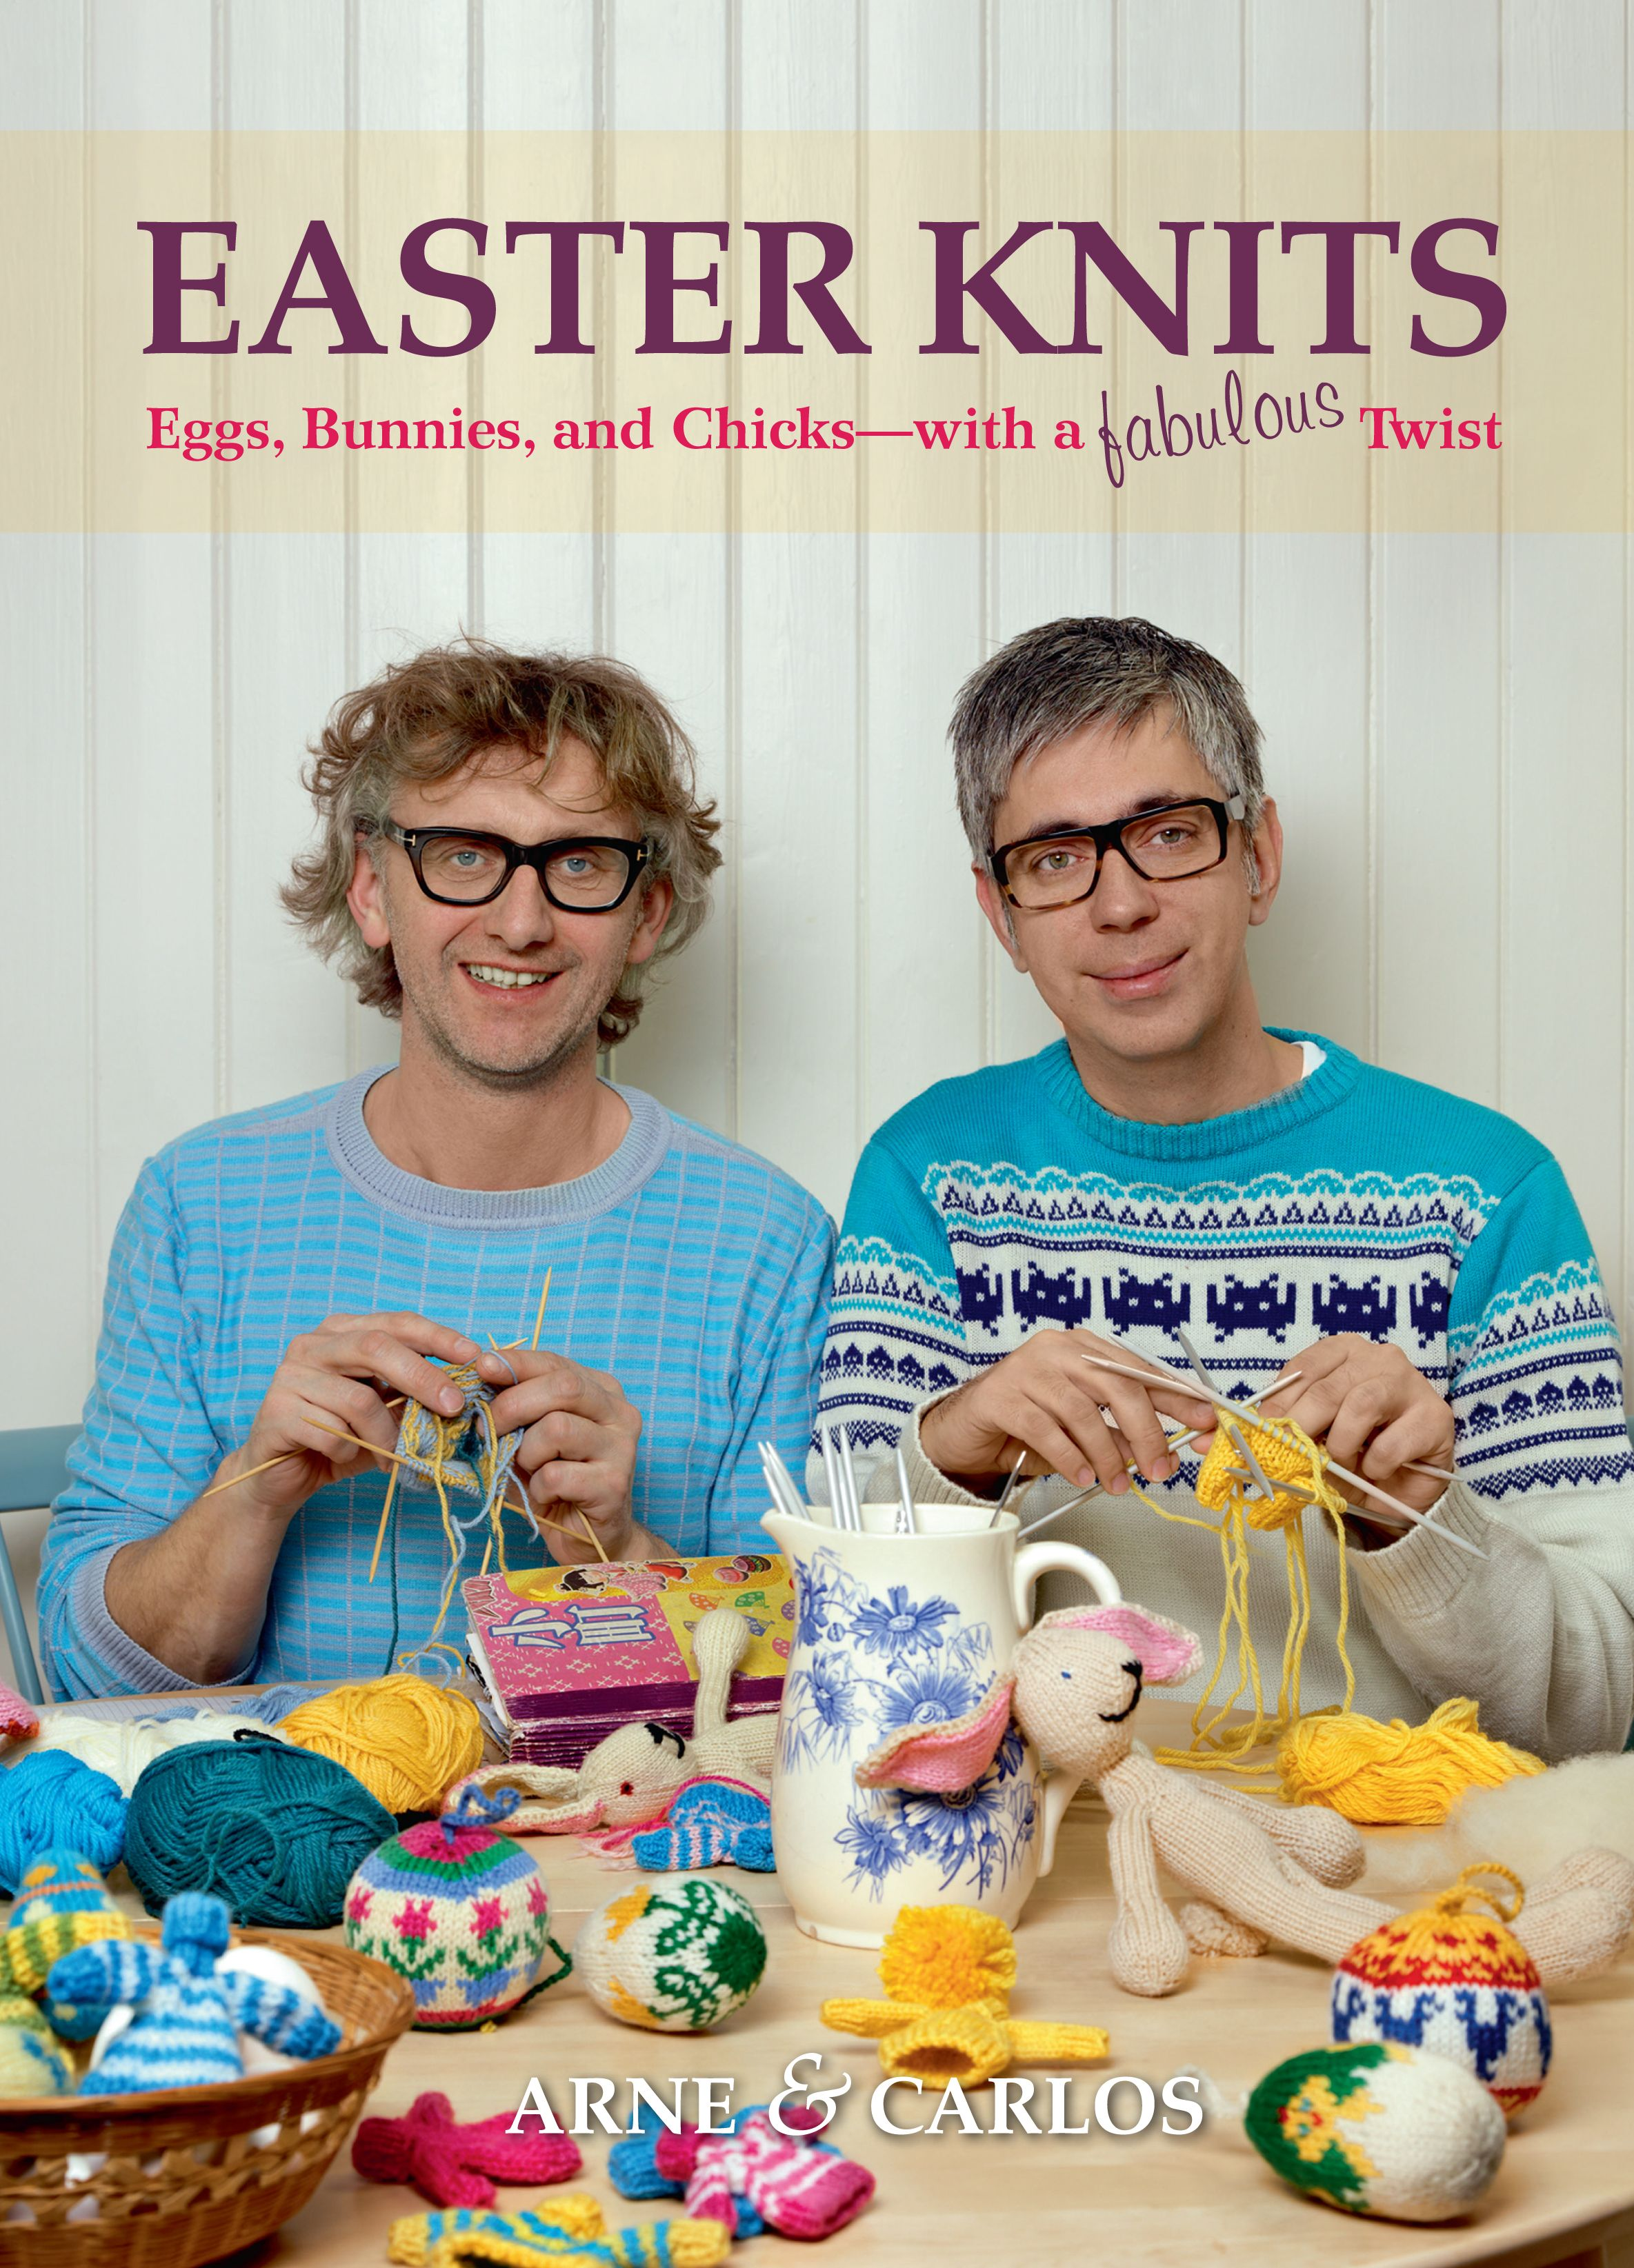 Arne & Carlos Eggs, Bunnies and Chicks